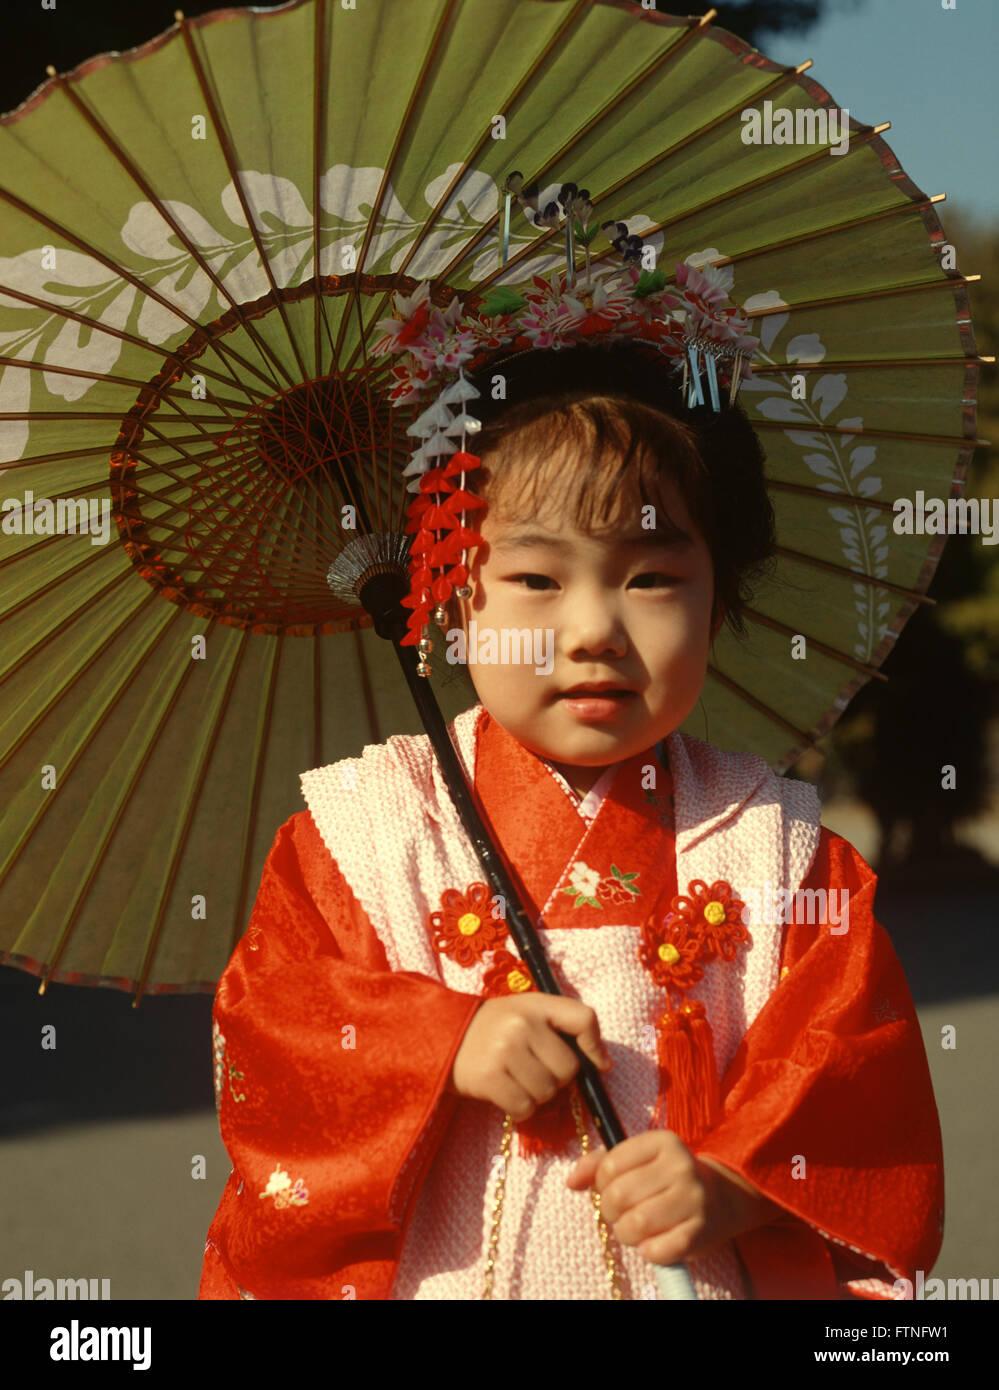 Japan Japanese child in traditional Kimono costume holding a sunshade.  sc 1 st  Alamy & Japan Japanese child in traditional Kimono costume holding a Stock ...